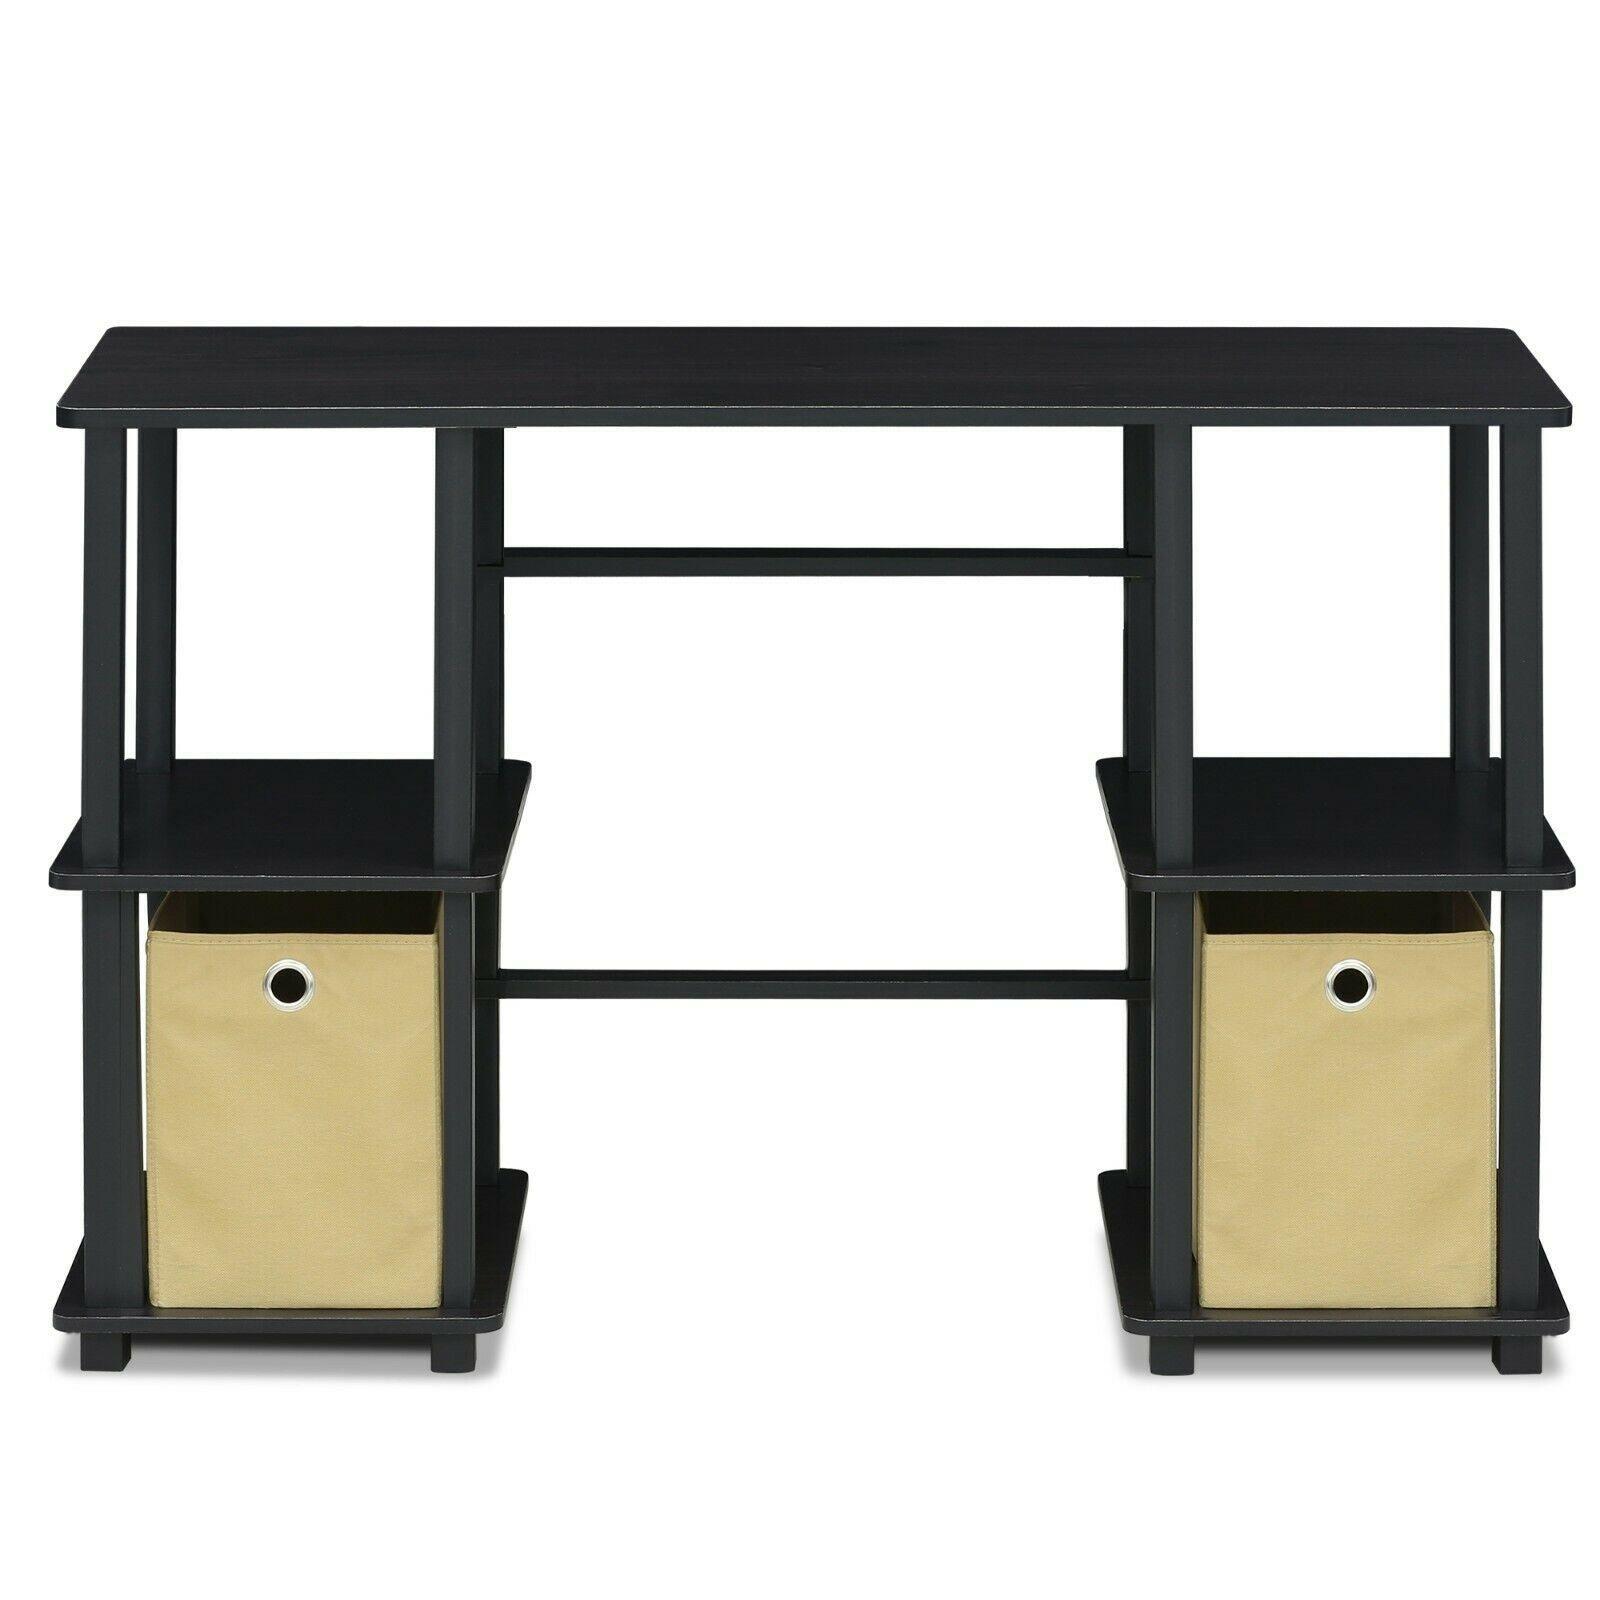 Furinno Turn-N-Tube Computer Desk with Storage Bins, Espresso/Black